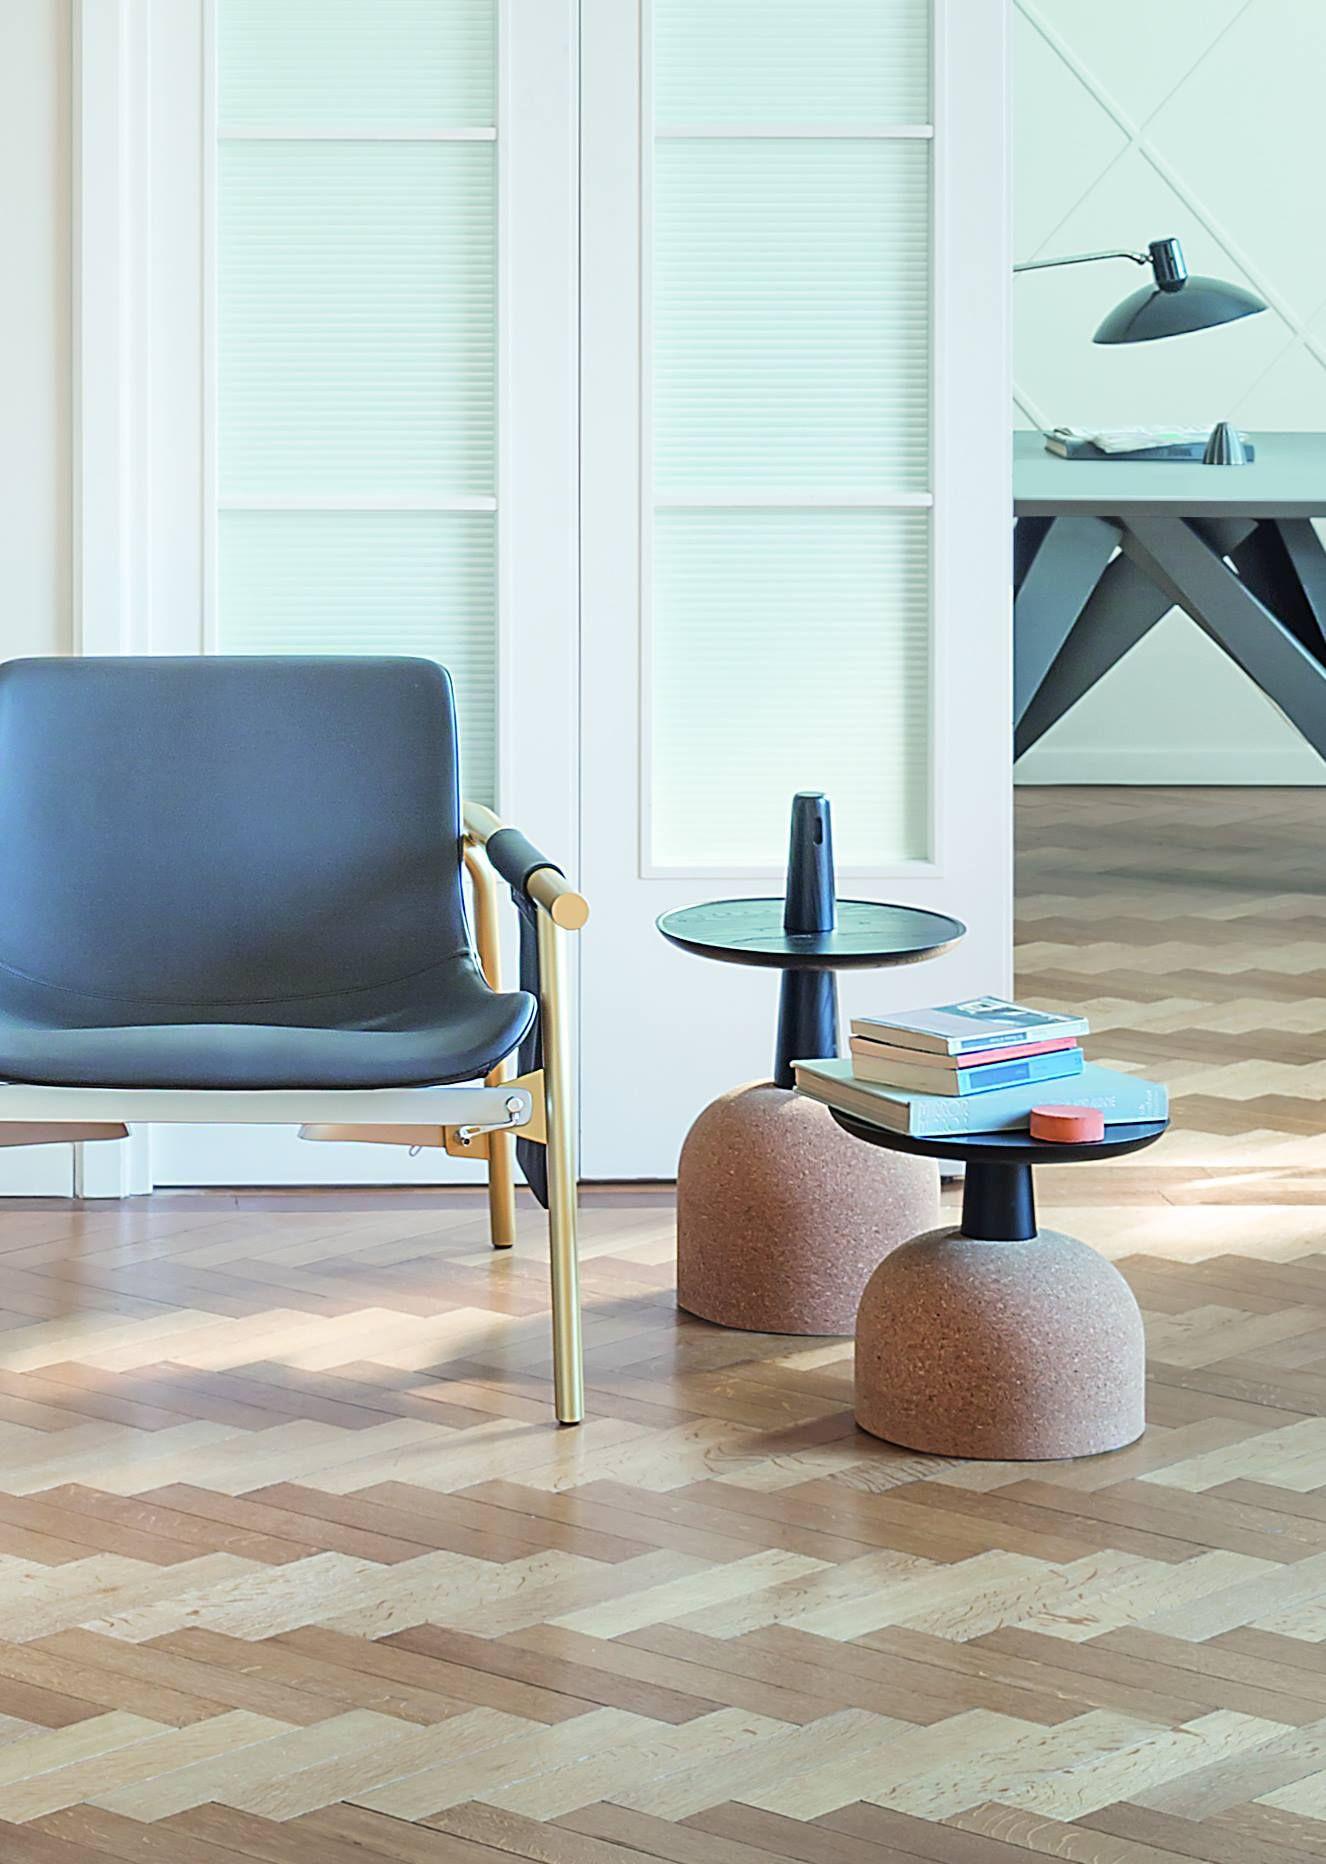 Italian Luxury Furniture Designer Furniture Singapore Da Vinci Lifestyle Wooden Coffee Table Designs Coffee Table Custom Furniture Design [ 1864 x 1326 Pixel ]